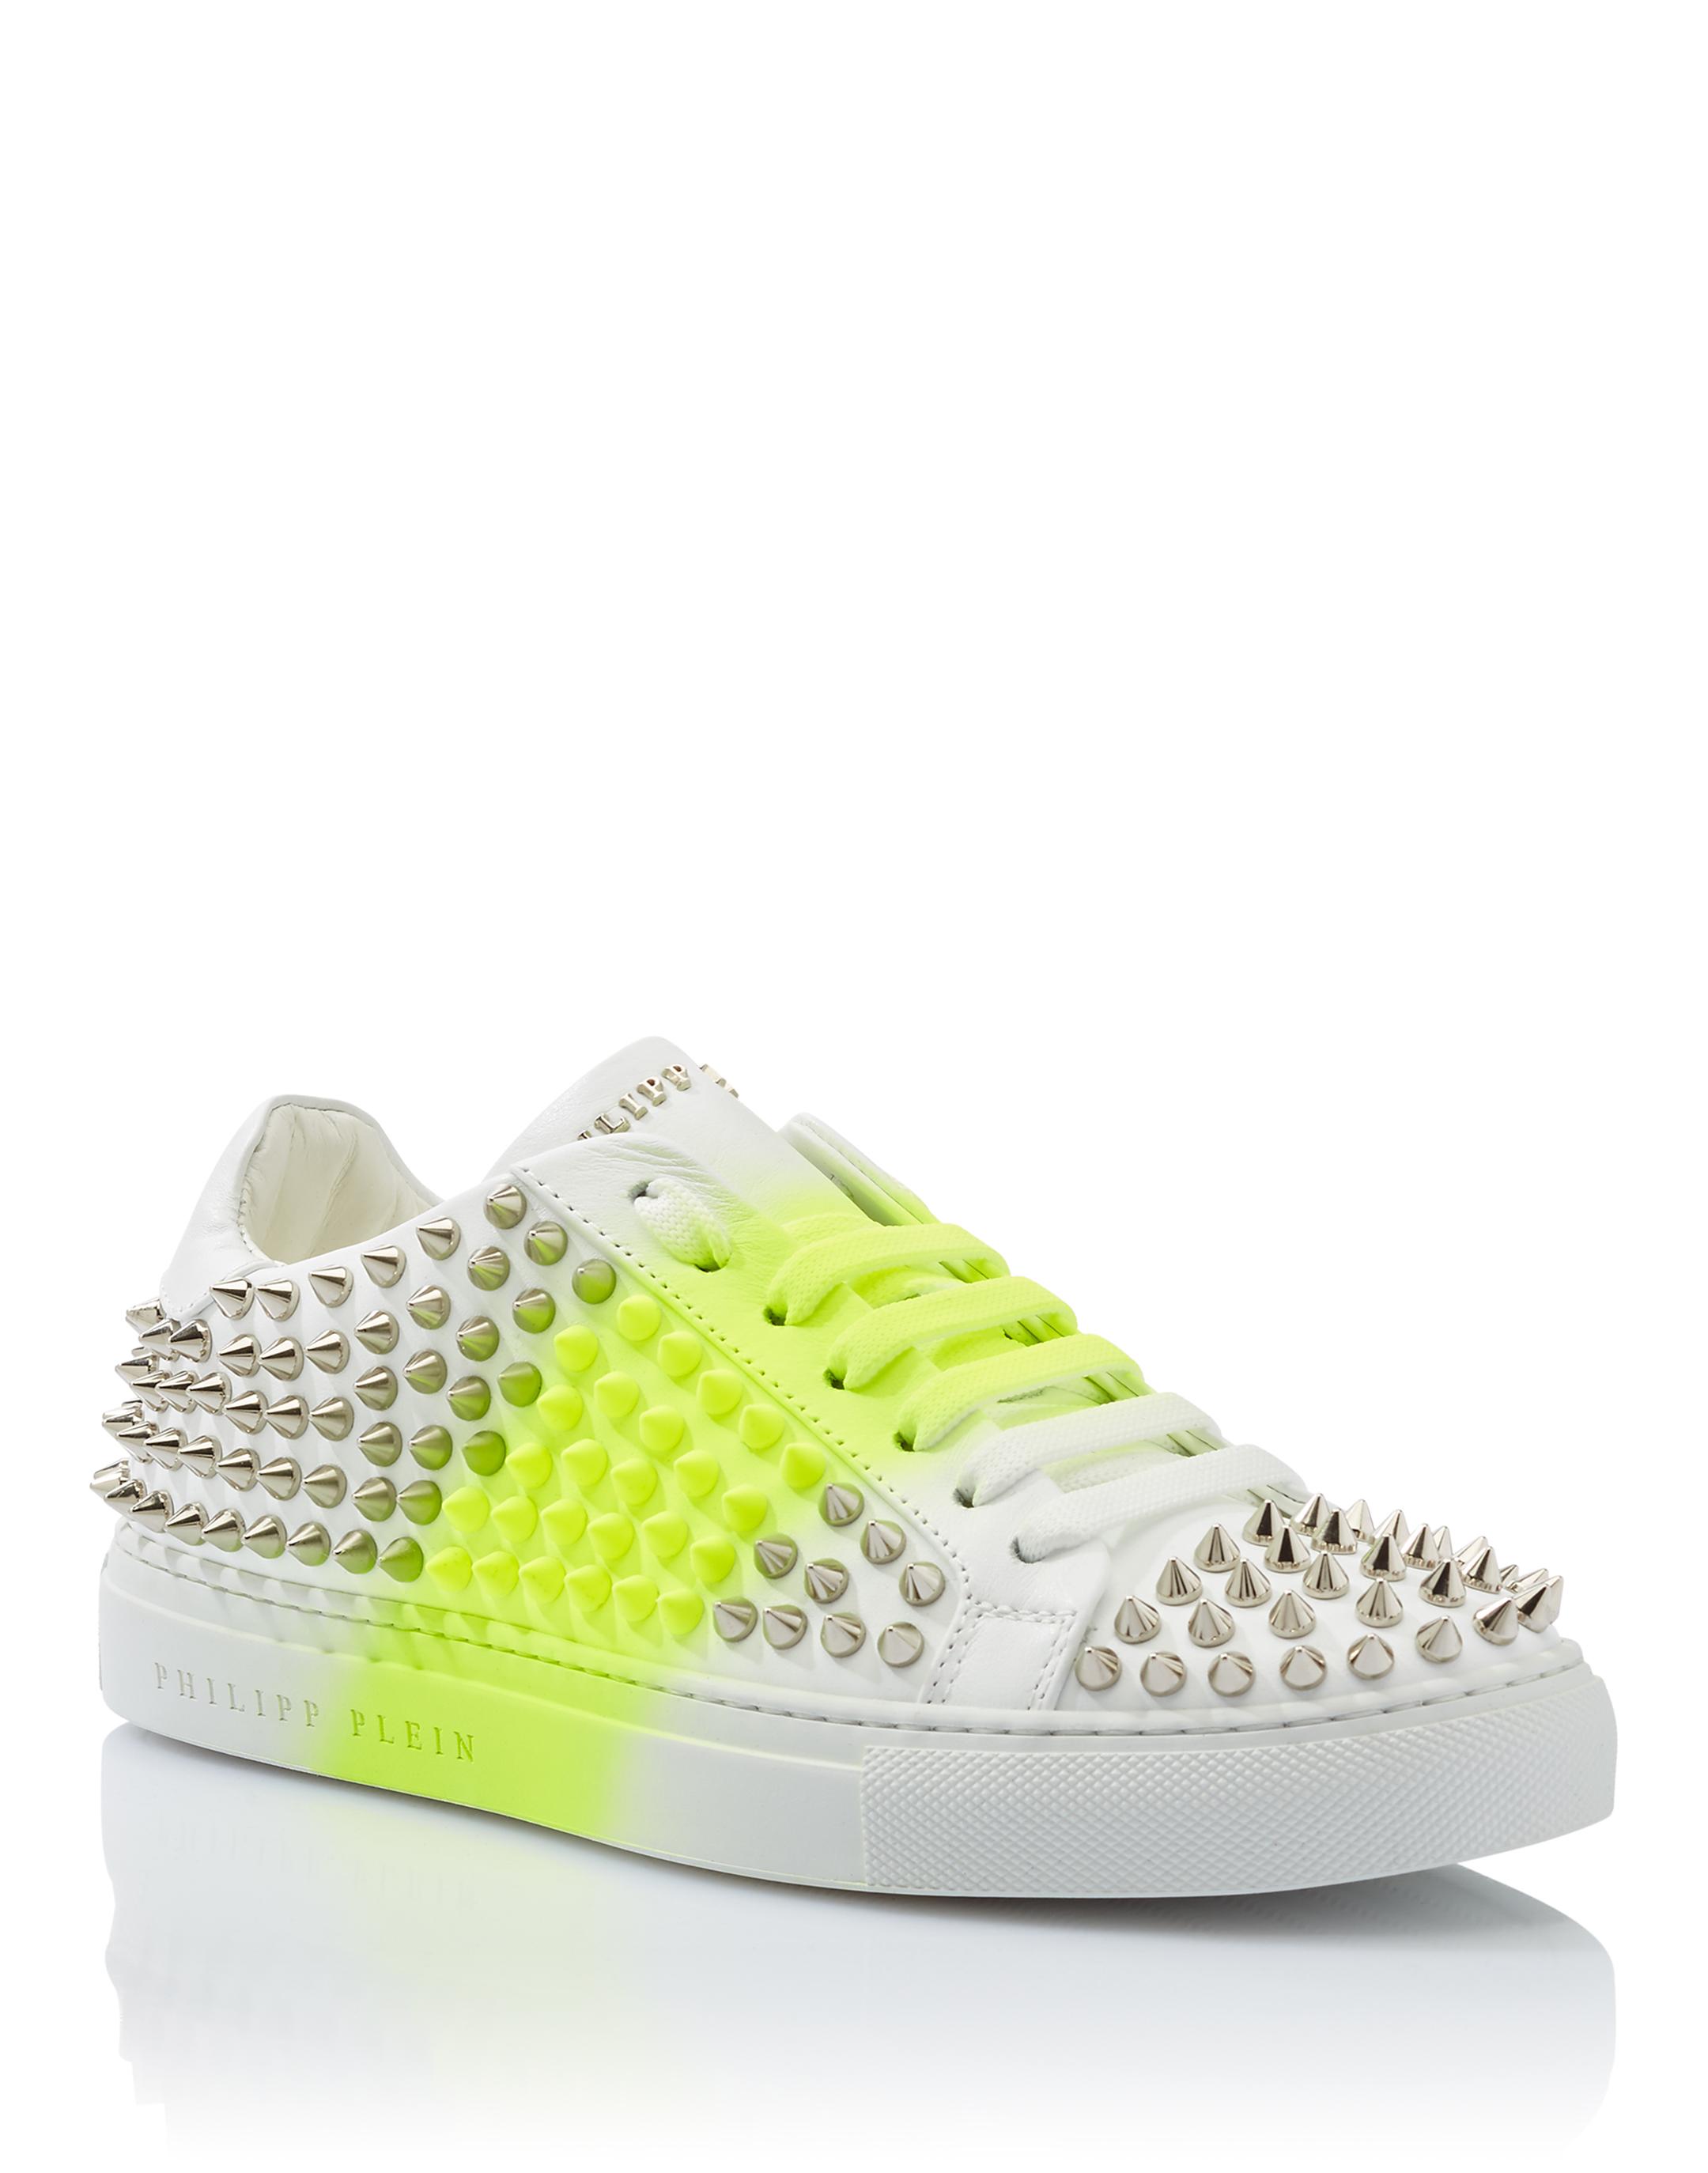 "Philipp Plein Lo-Top Sneakers ""Pink me"""